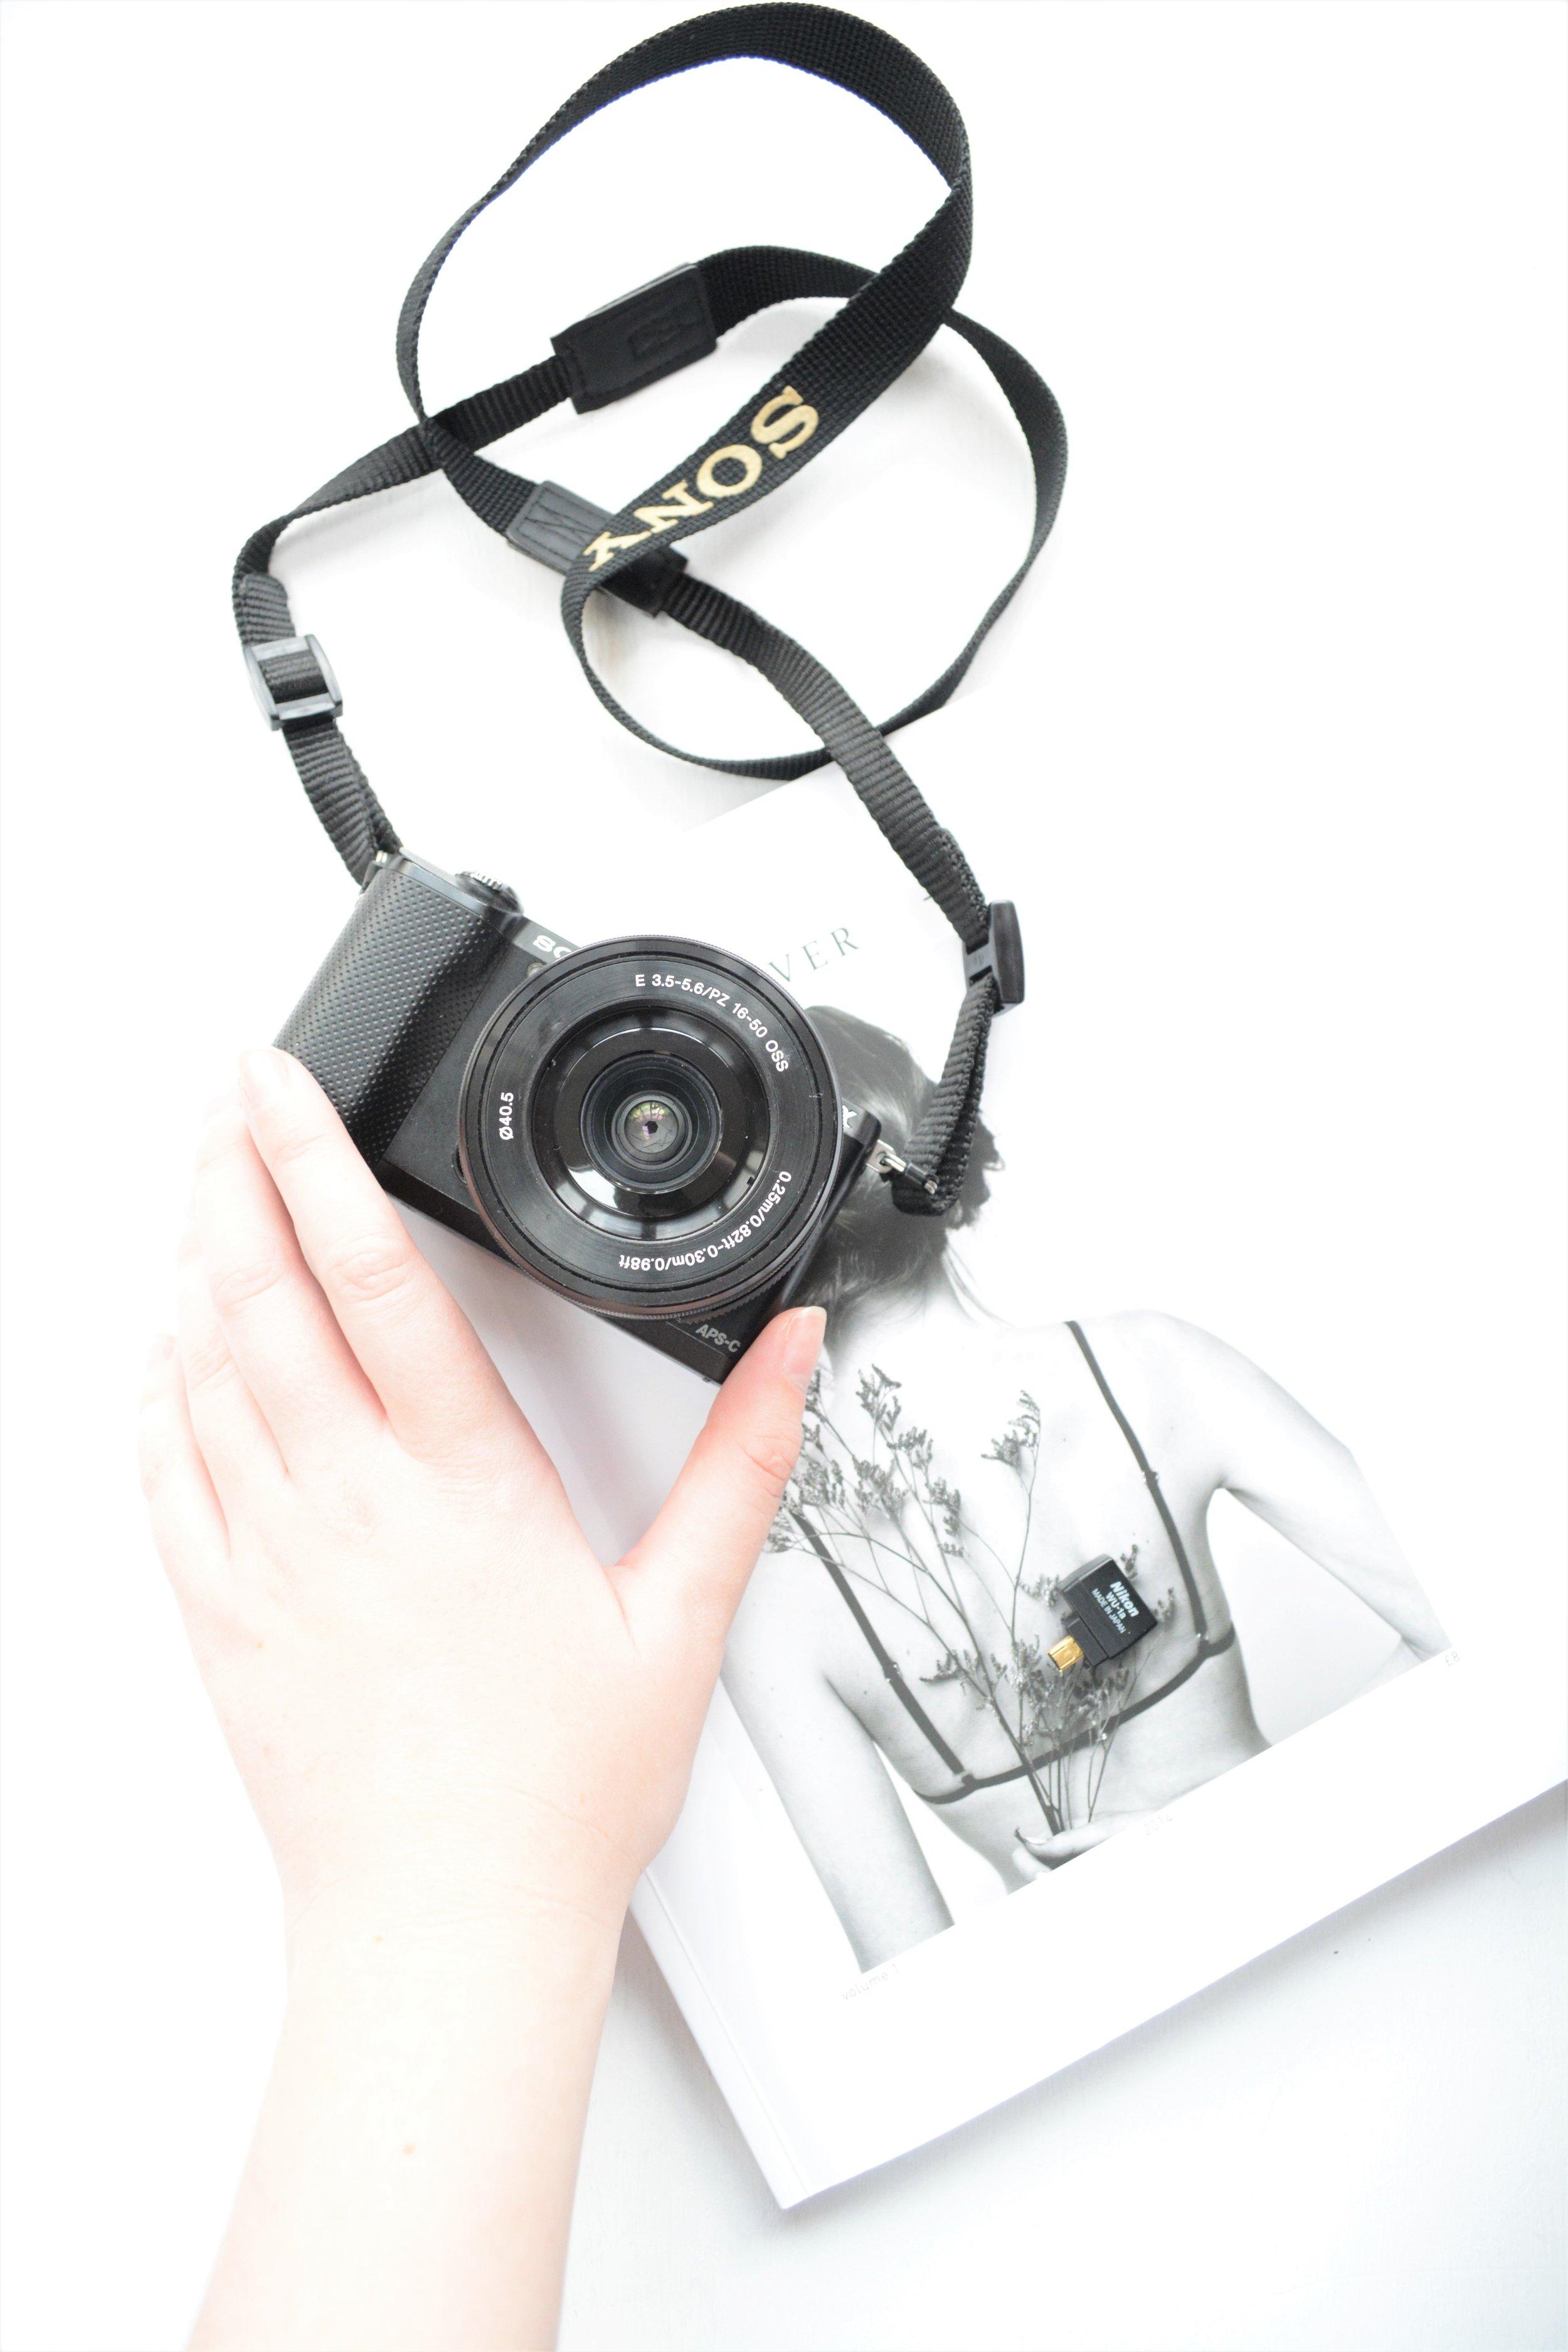 Exploring The Basics Of Photography (1).JPG